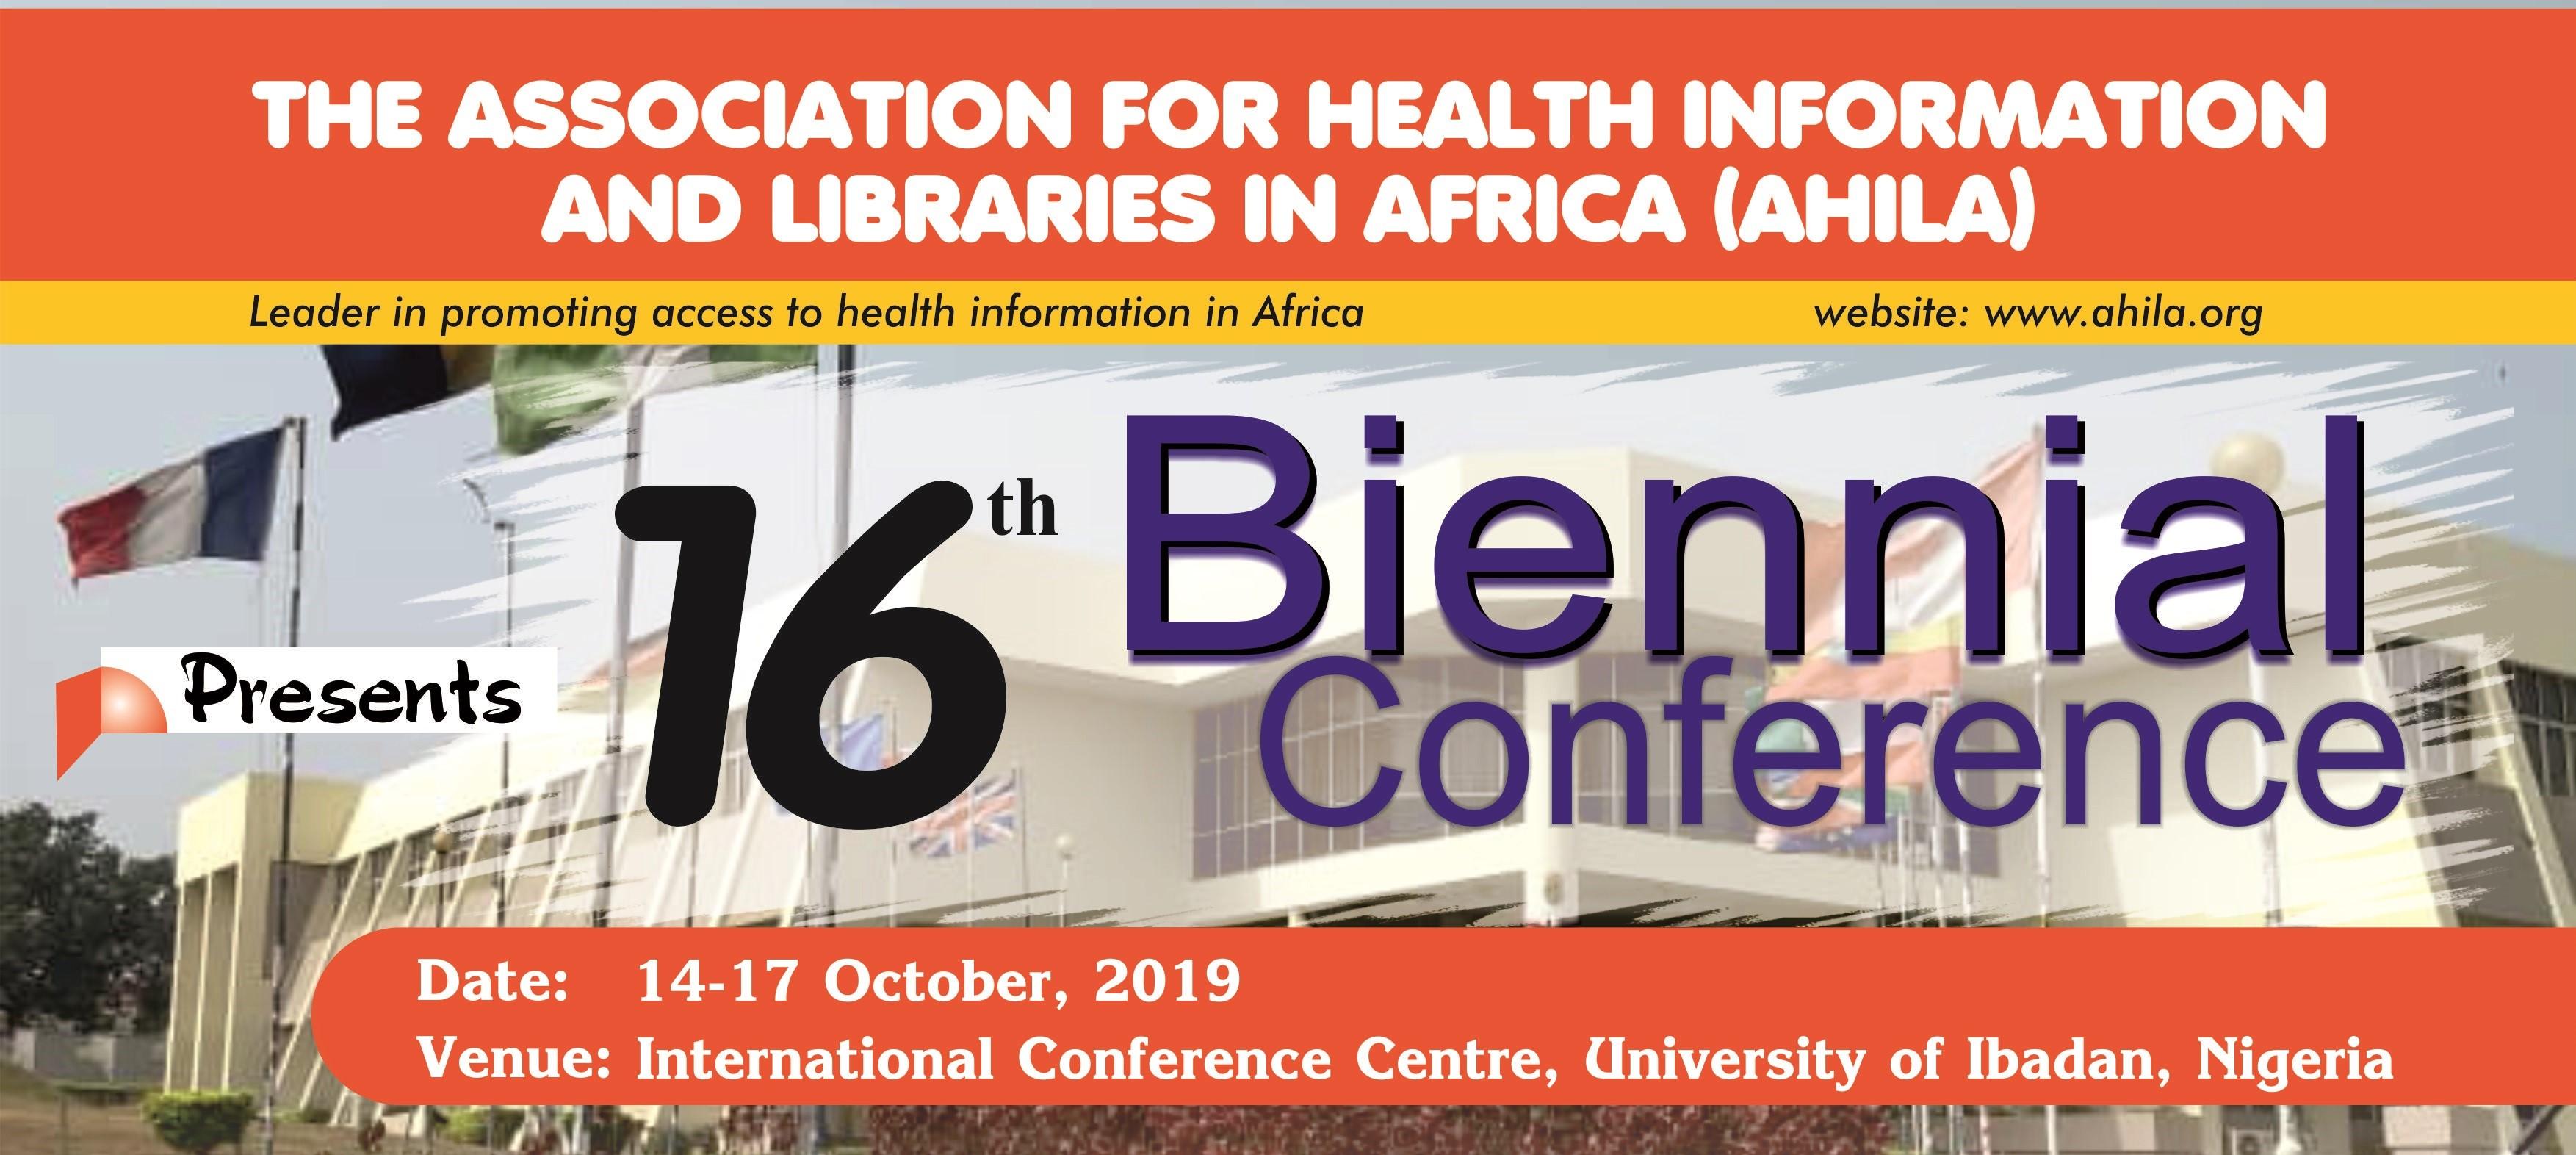 Conferences - AHILA